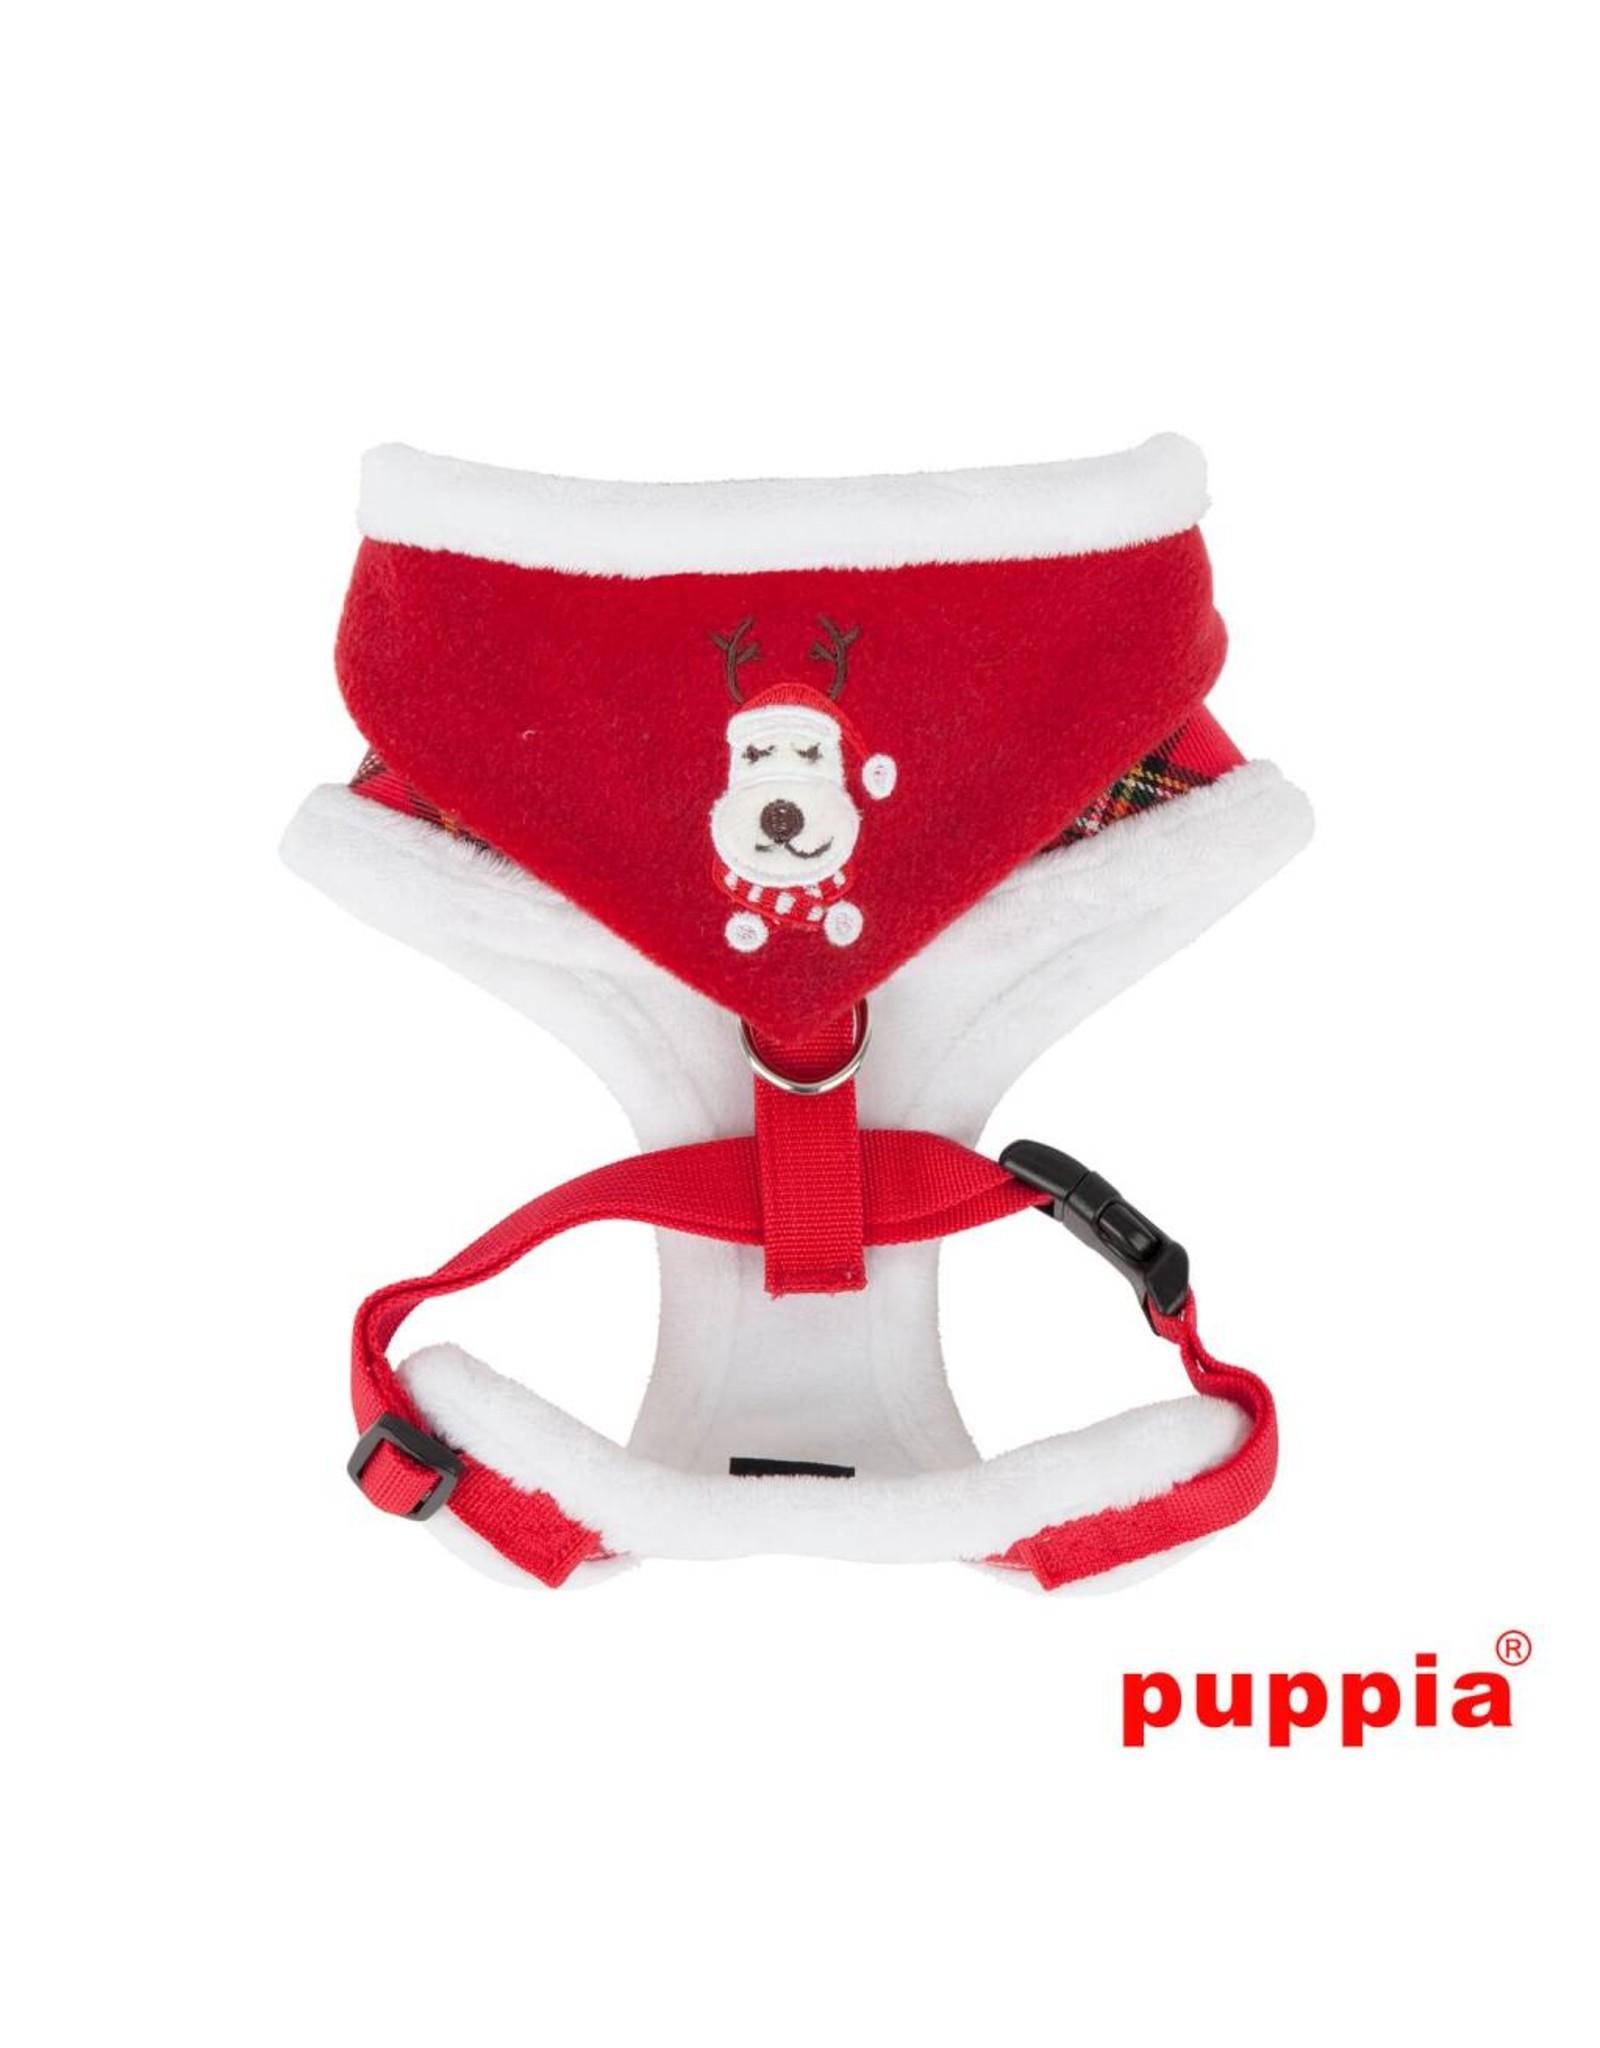 Puppia Puppia Rudolph Harness A Checkered Red